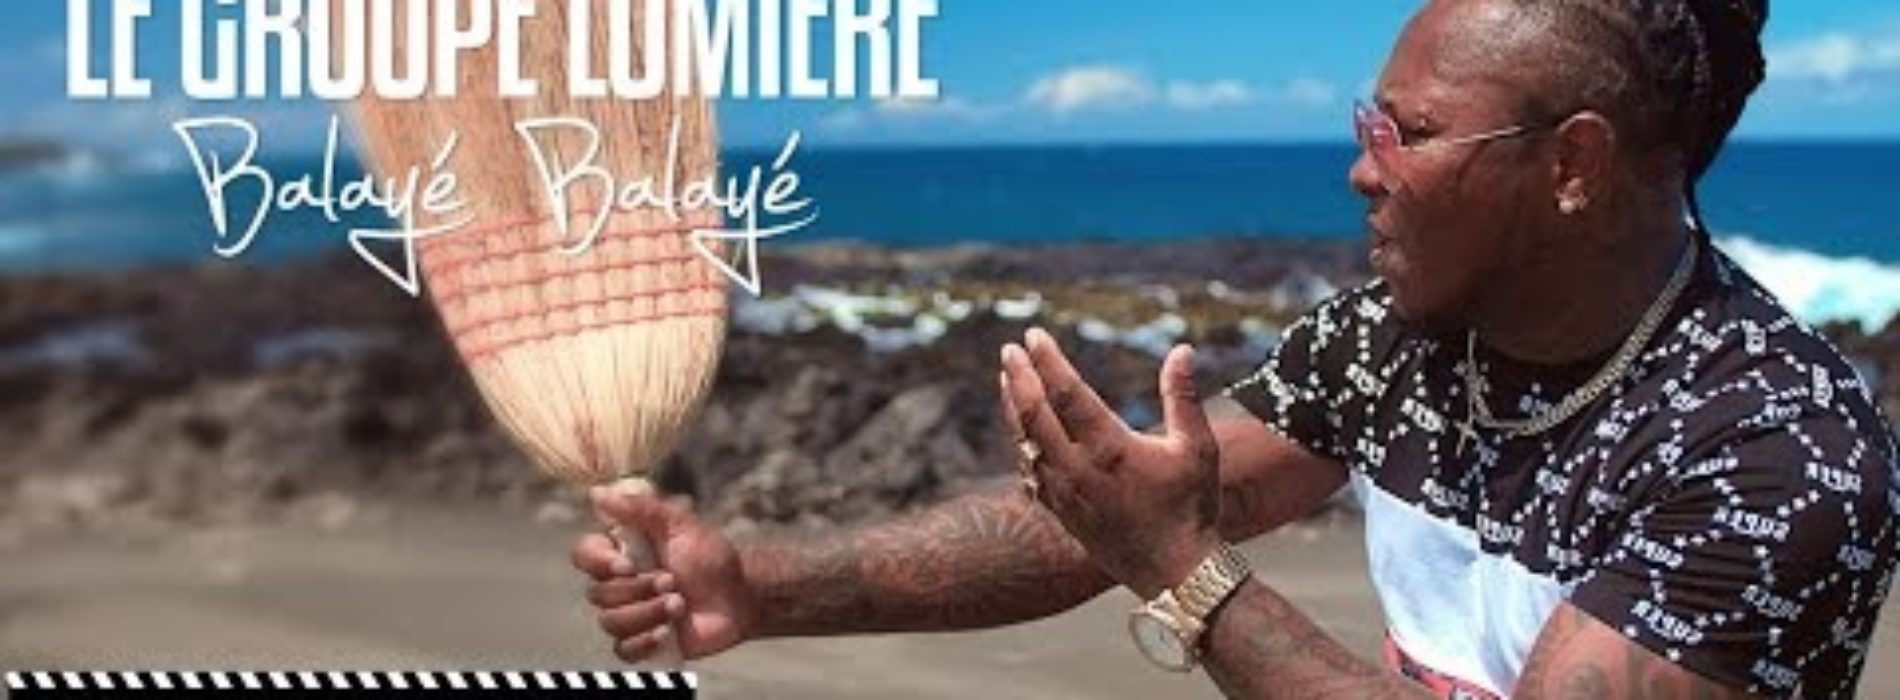 Balayé balayé – LE GROUPE LUMIERE // L' amour sacré – Sylvio Mailly [CLIP OFFICIEL] – Mars 2020